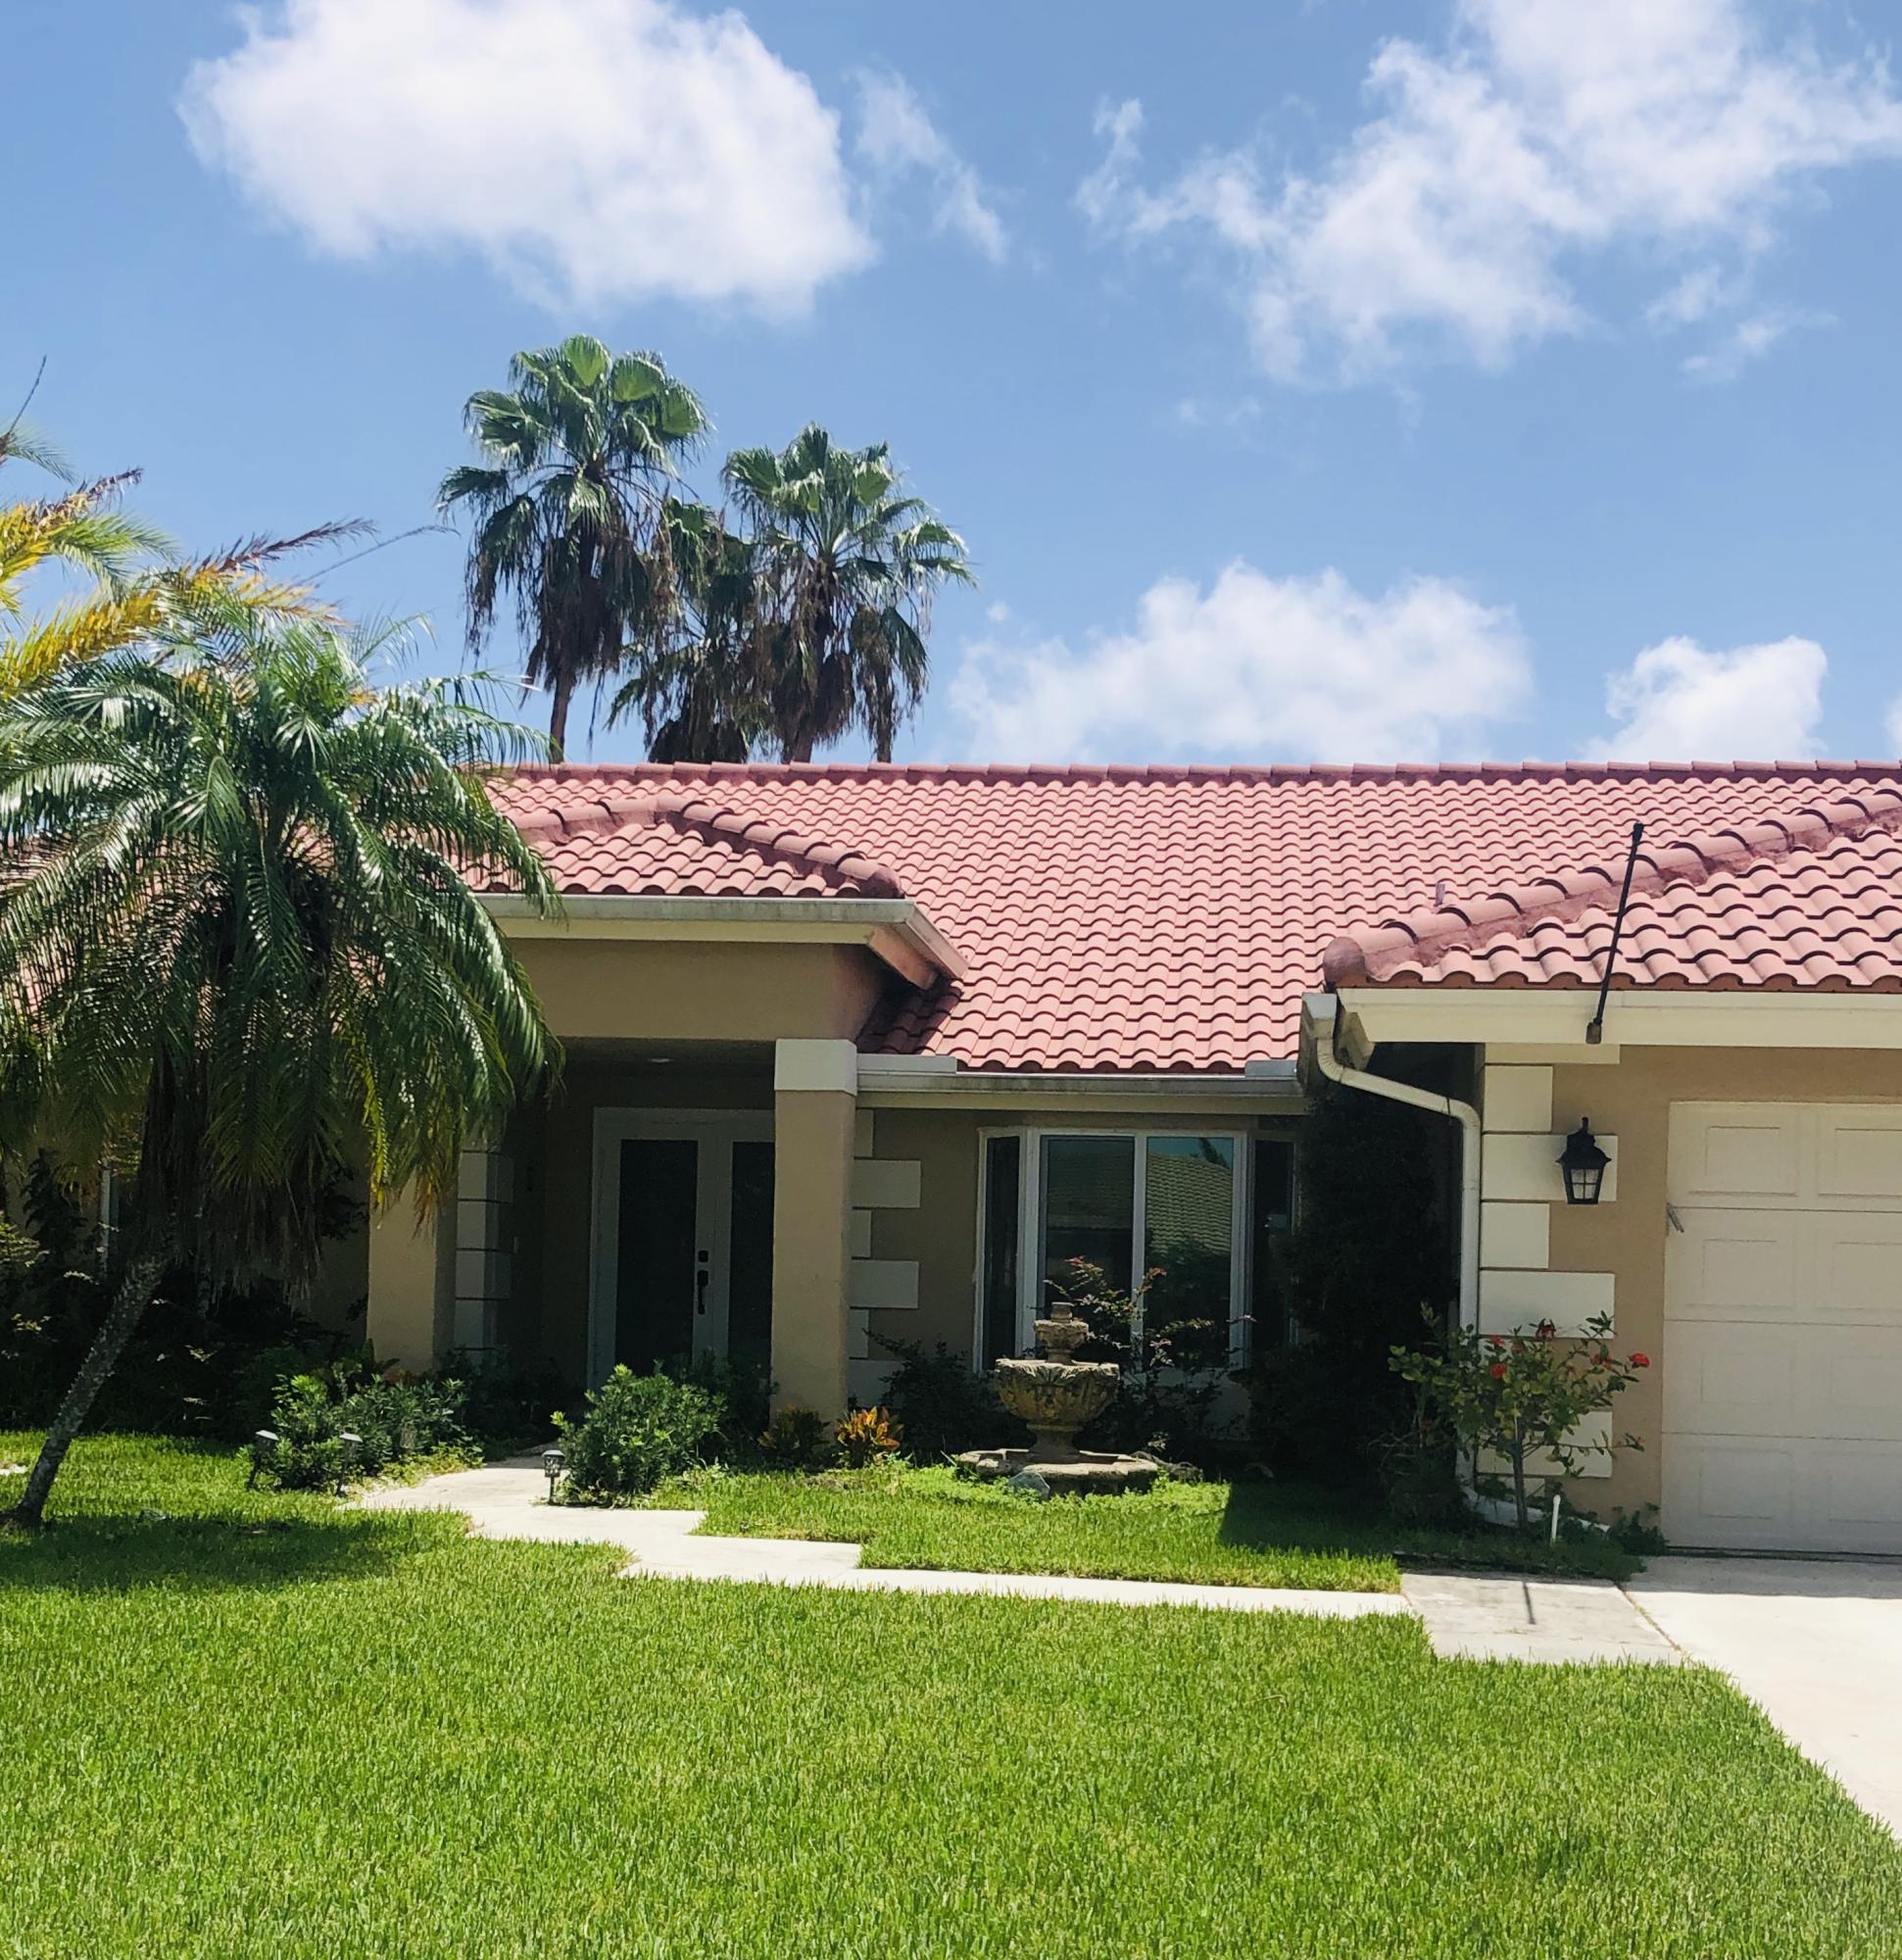 20650 Bay Brooke Court, Boca Raton, FL 33498